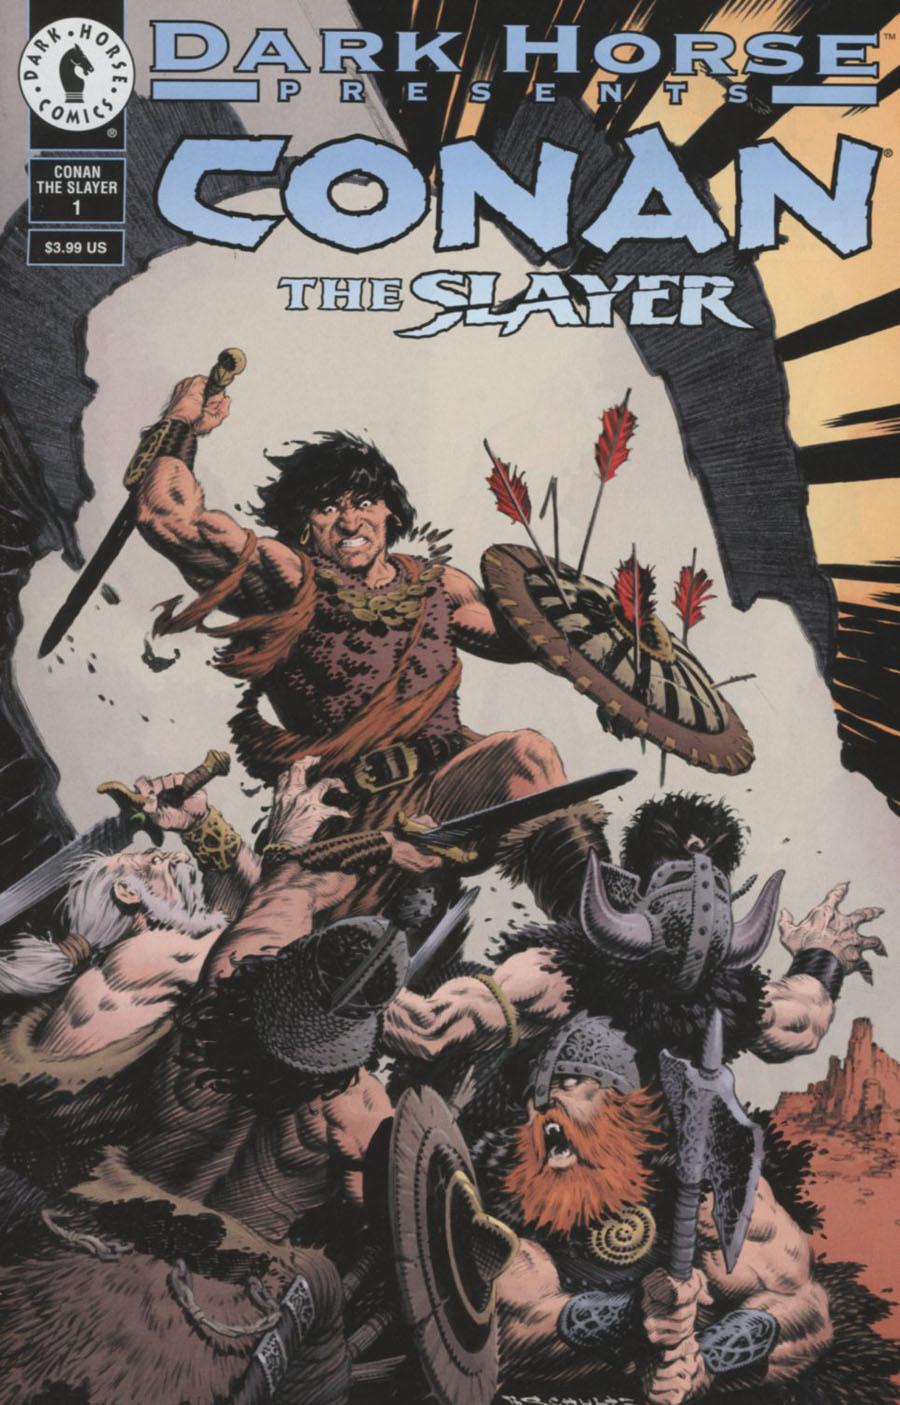 Conan The Slayer #1 Cover B Variant Mark Schultz Dark Horse 30th Anniversary Cover